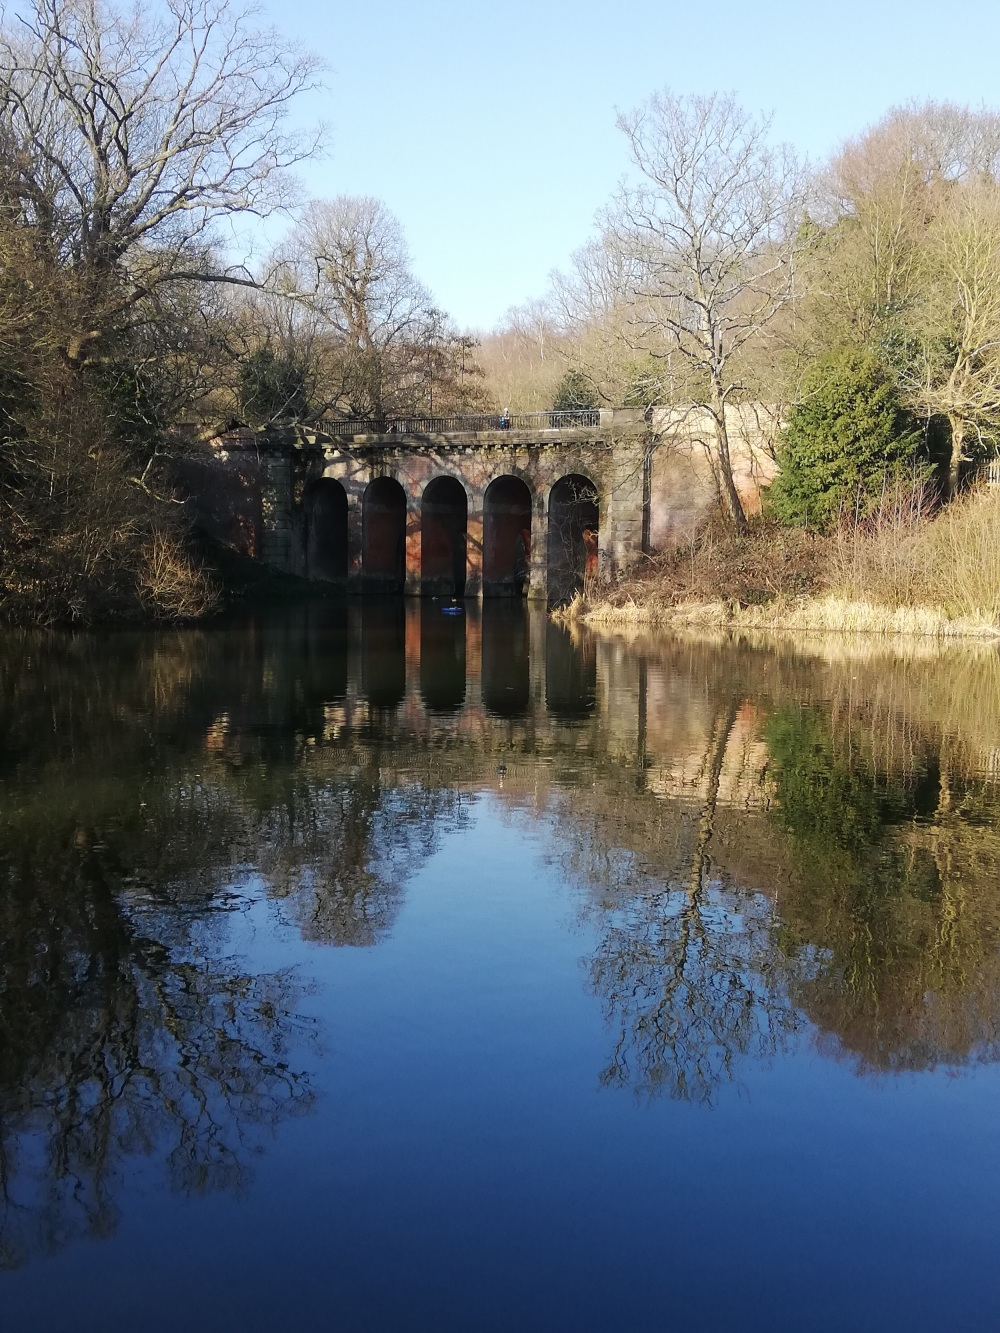 The Hampstead Viaduct